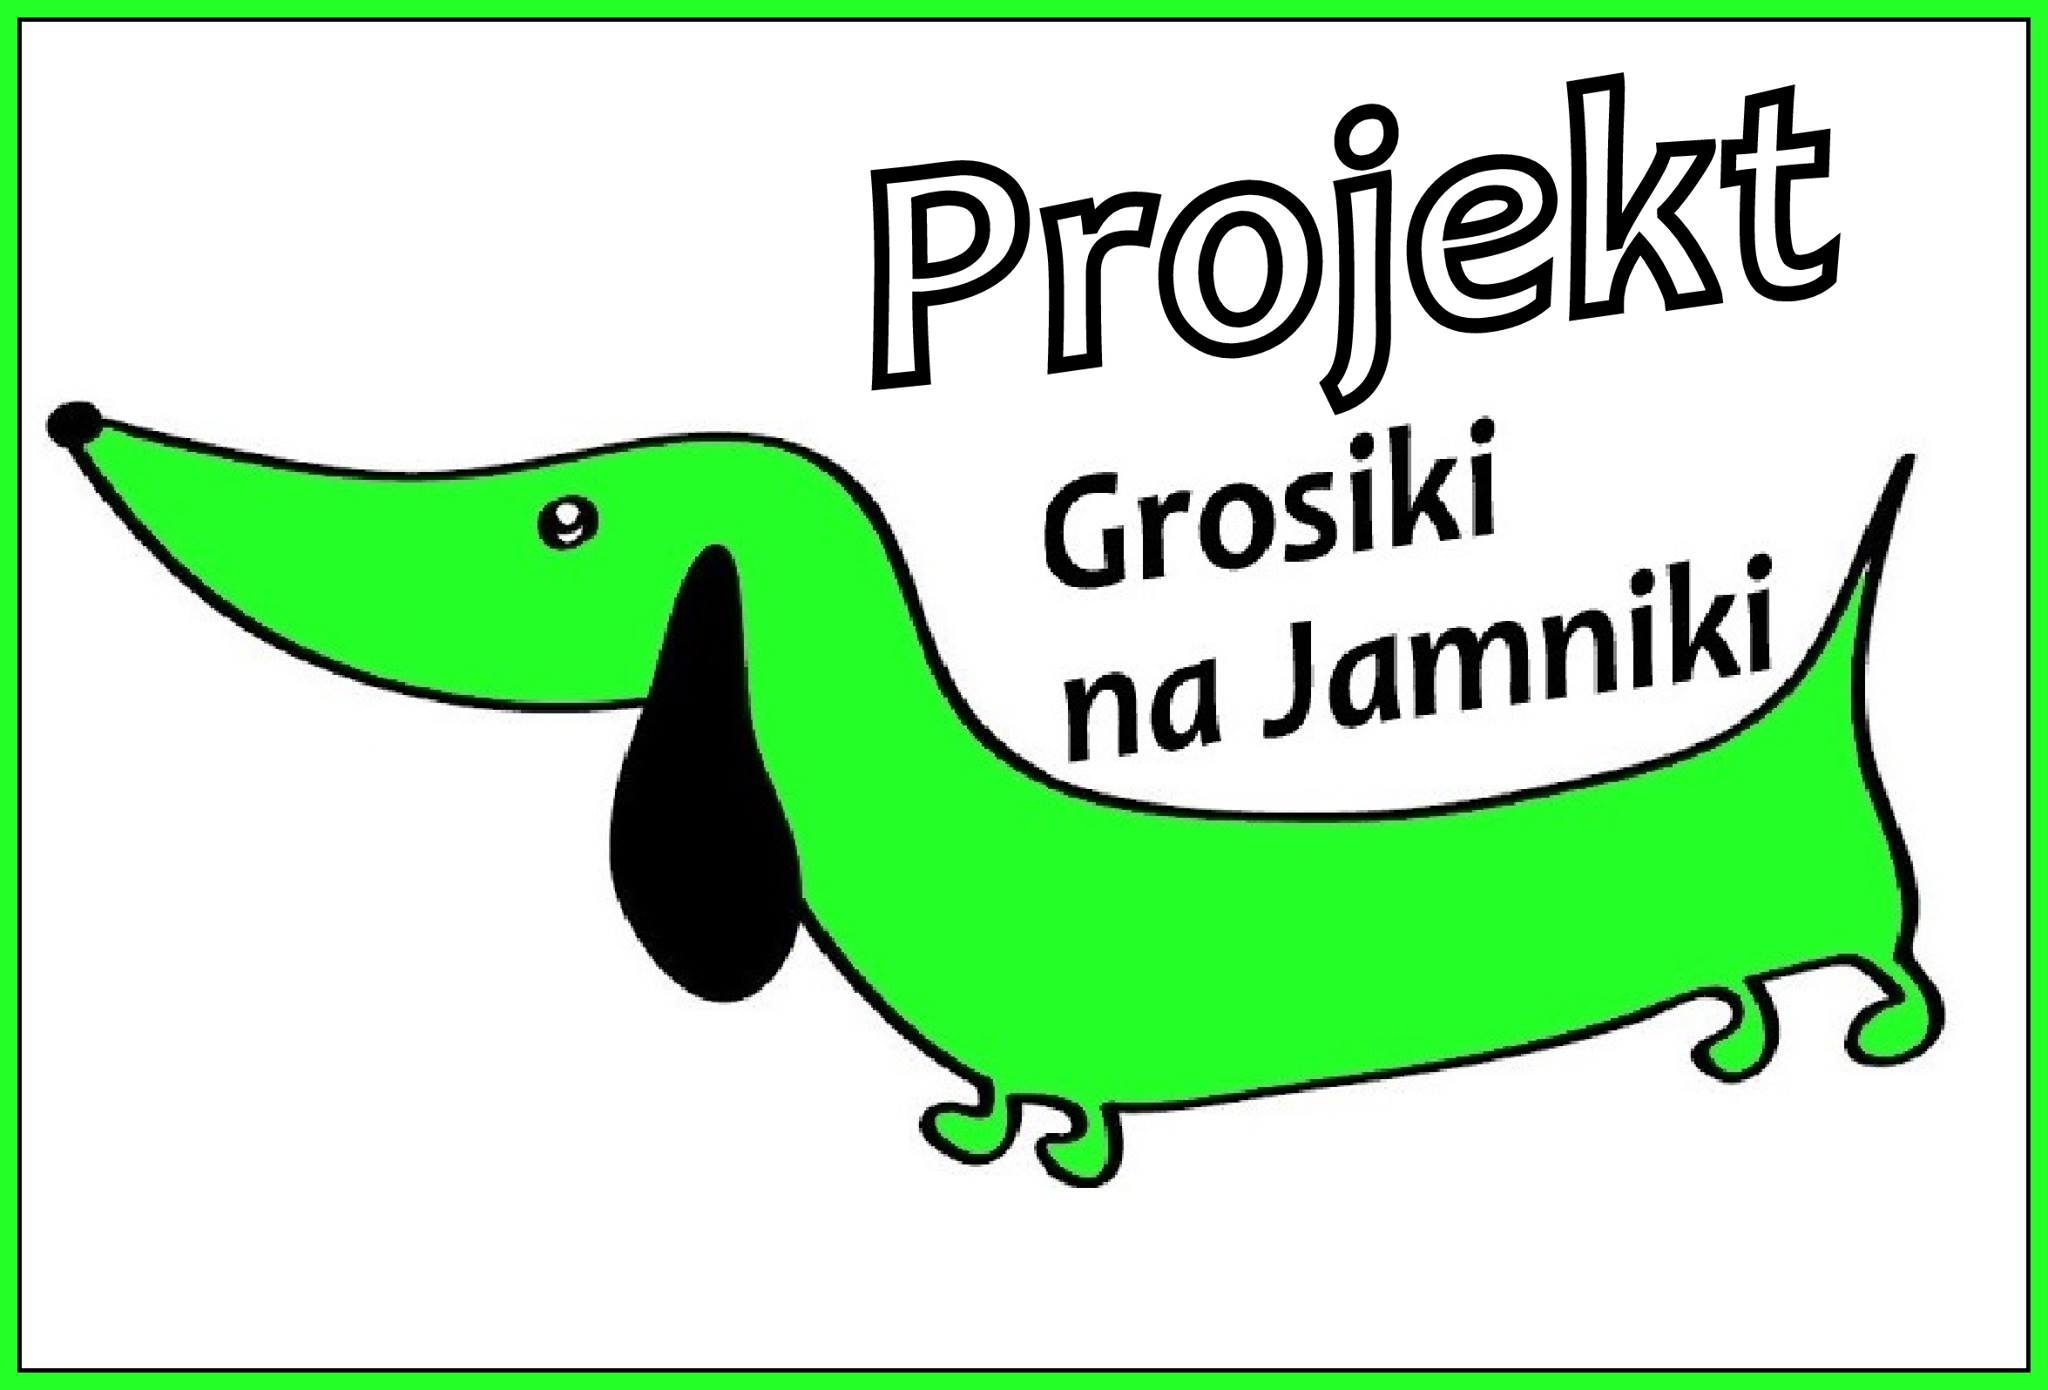 Projekt Grosiki